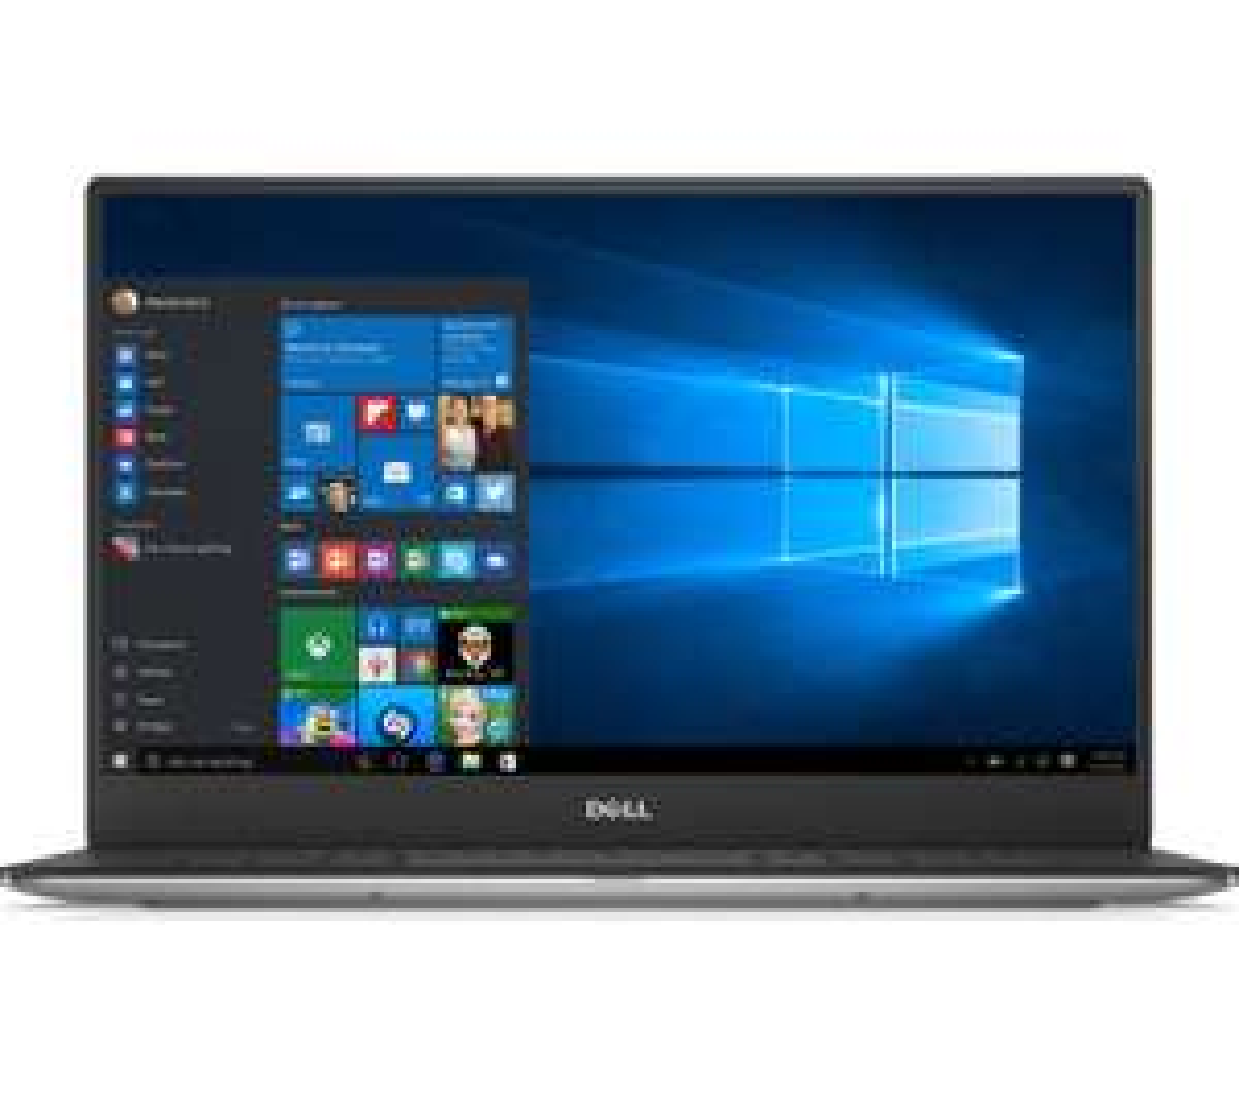 Dell XPS 13 With 13.3 Inch Full HD InfinityEdge Display, Intel® Core ™ I5-8250U Quad-Core Processor, 8GB RAM, 256GB SSD @ Very on BNPL